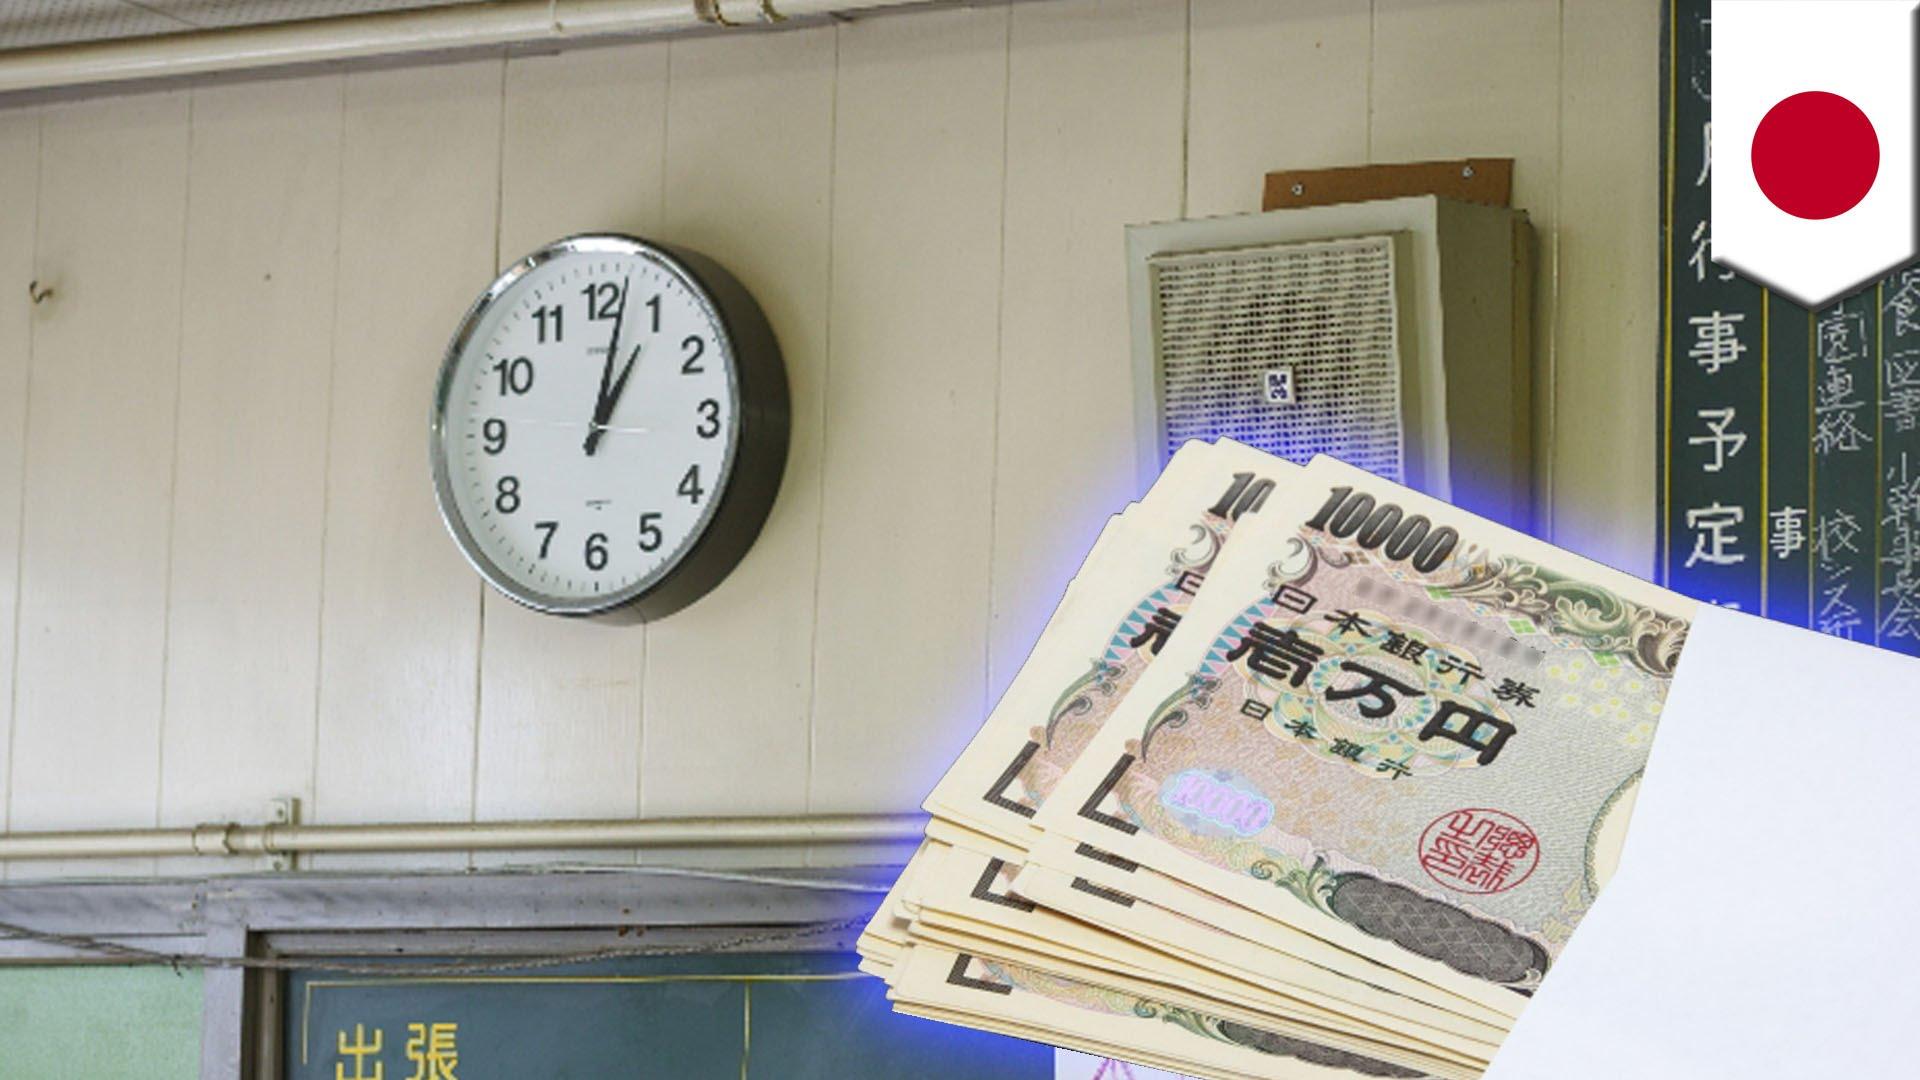 職員室で部活動費21万円盗む 中学教諭逮捕